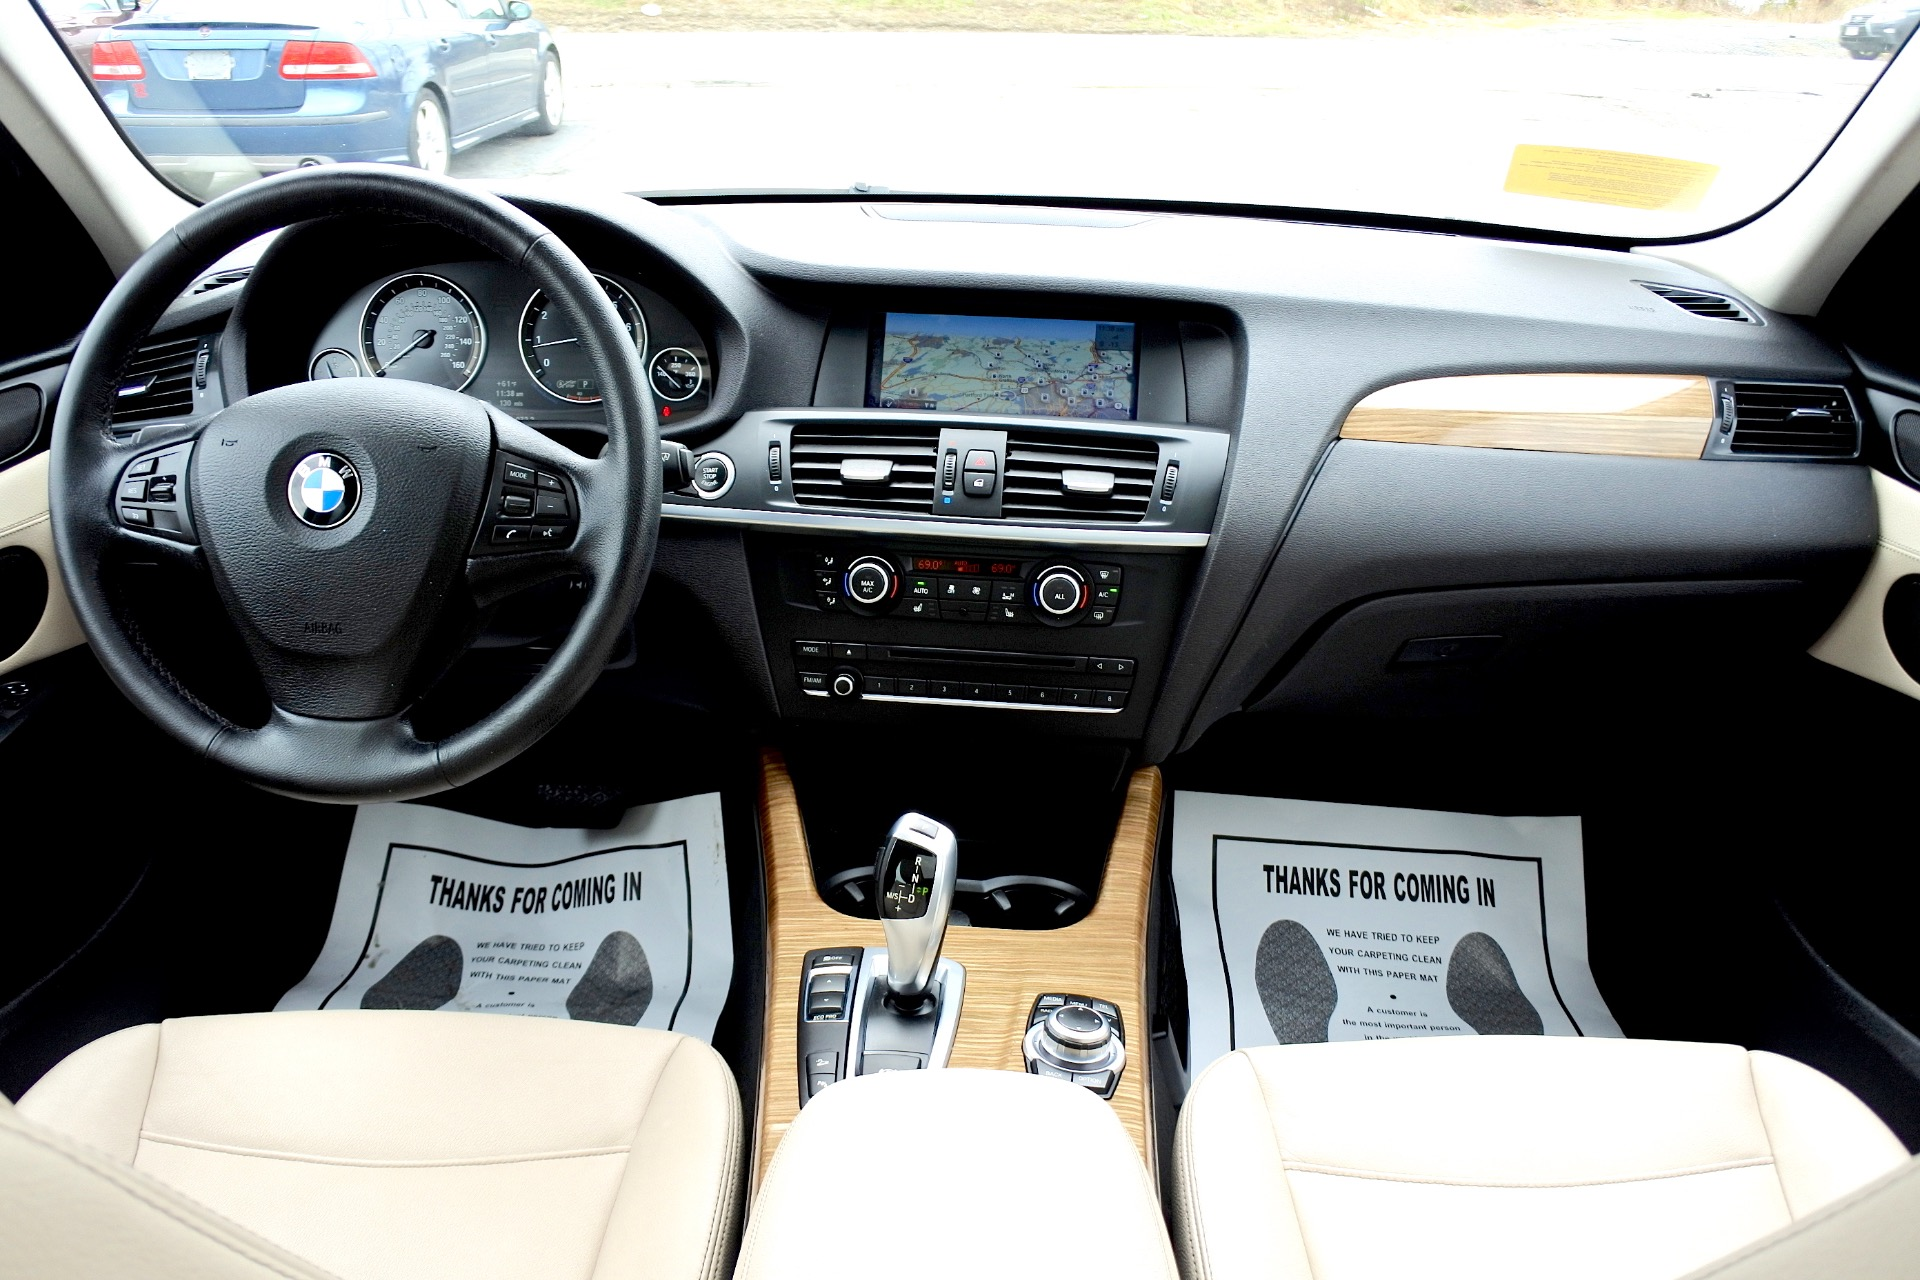 Used 2013 BMW X3 xDrive28i AWD Used 2013 BMW X3 xDrive28i AWD for sale  at Metro West Motorcars LLC in Shrewsbury MA 9